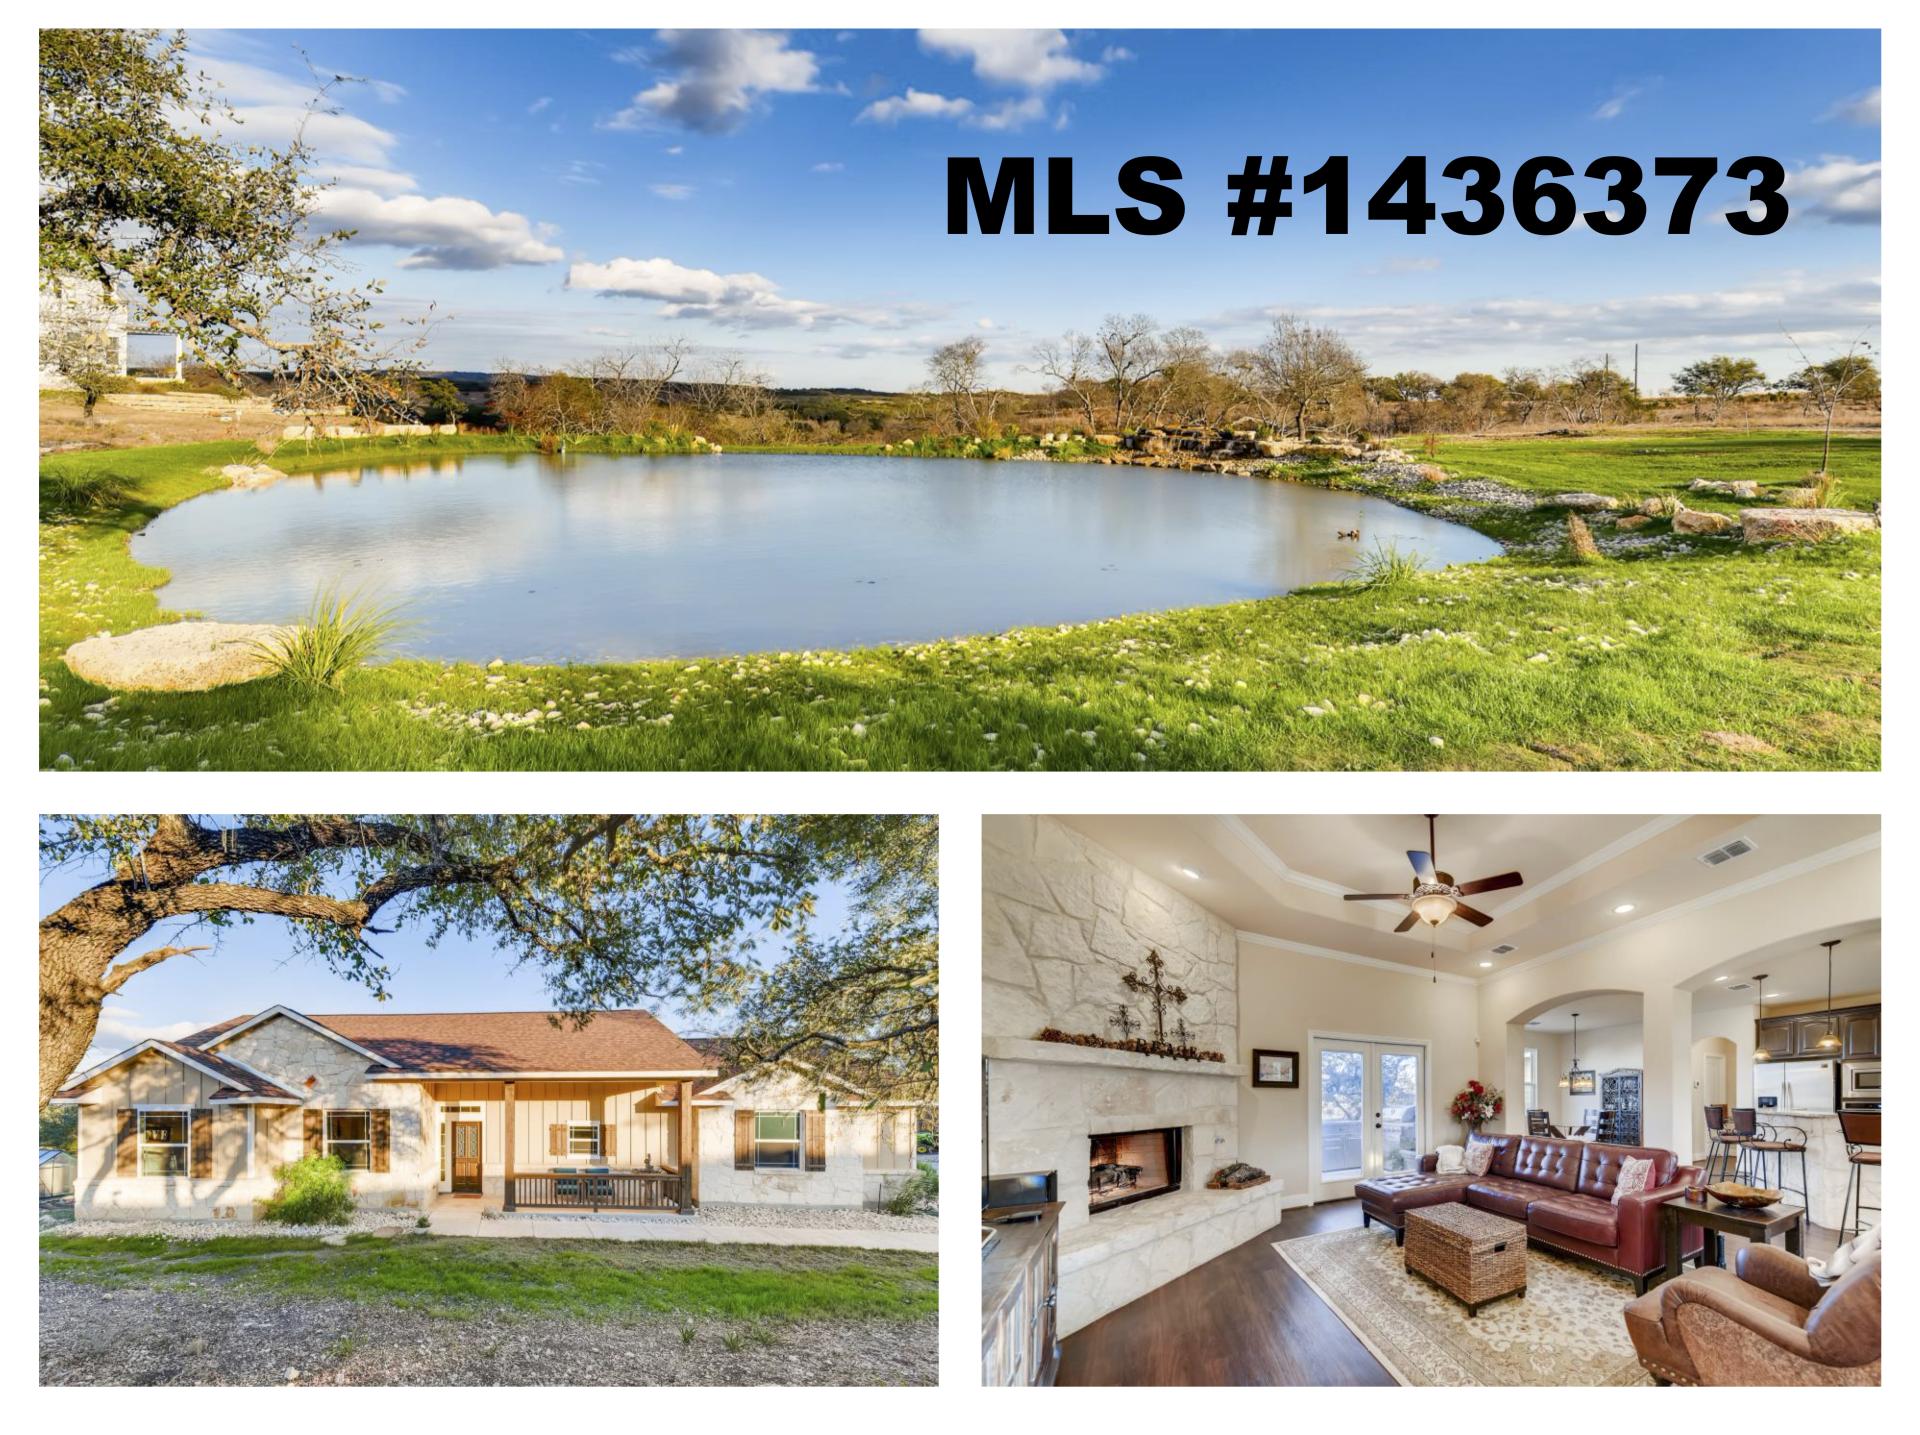 Dream Home in Boerne, TX